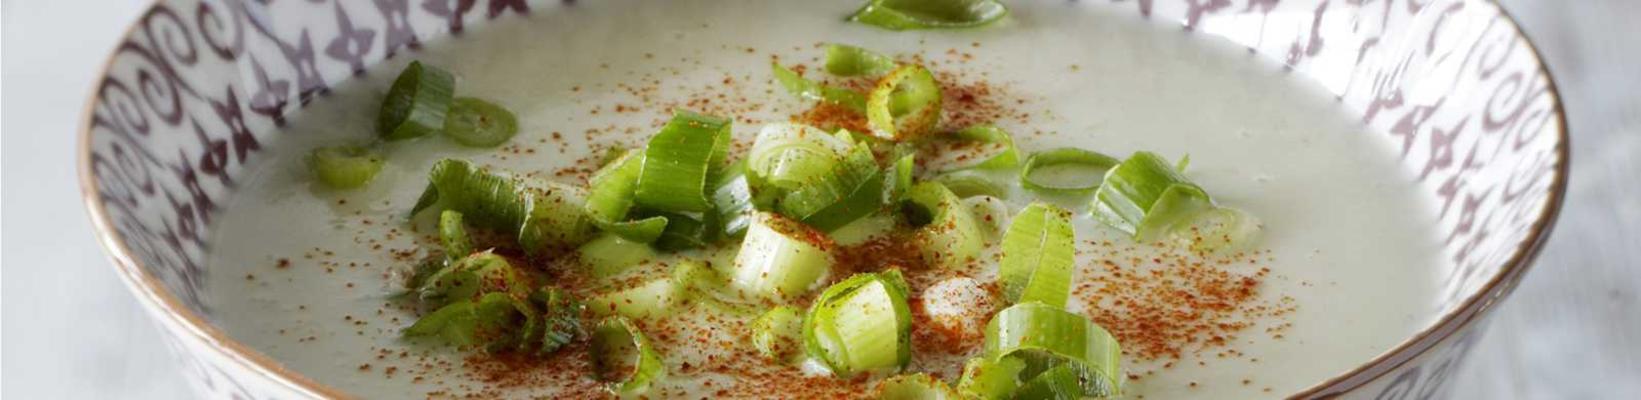 celeriac soup with red onion crostini